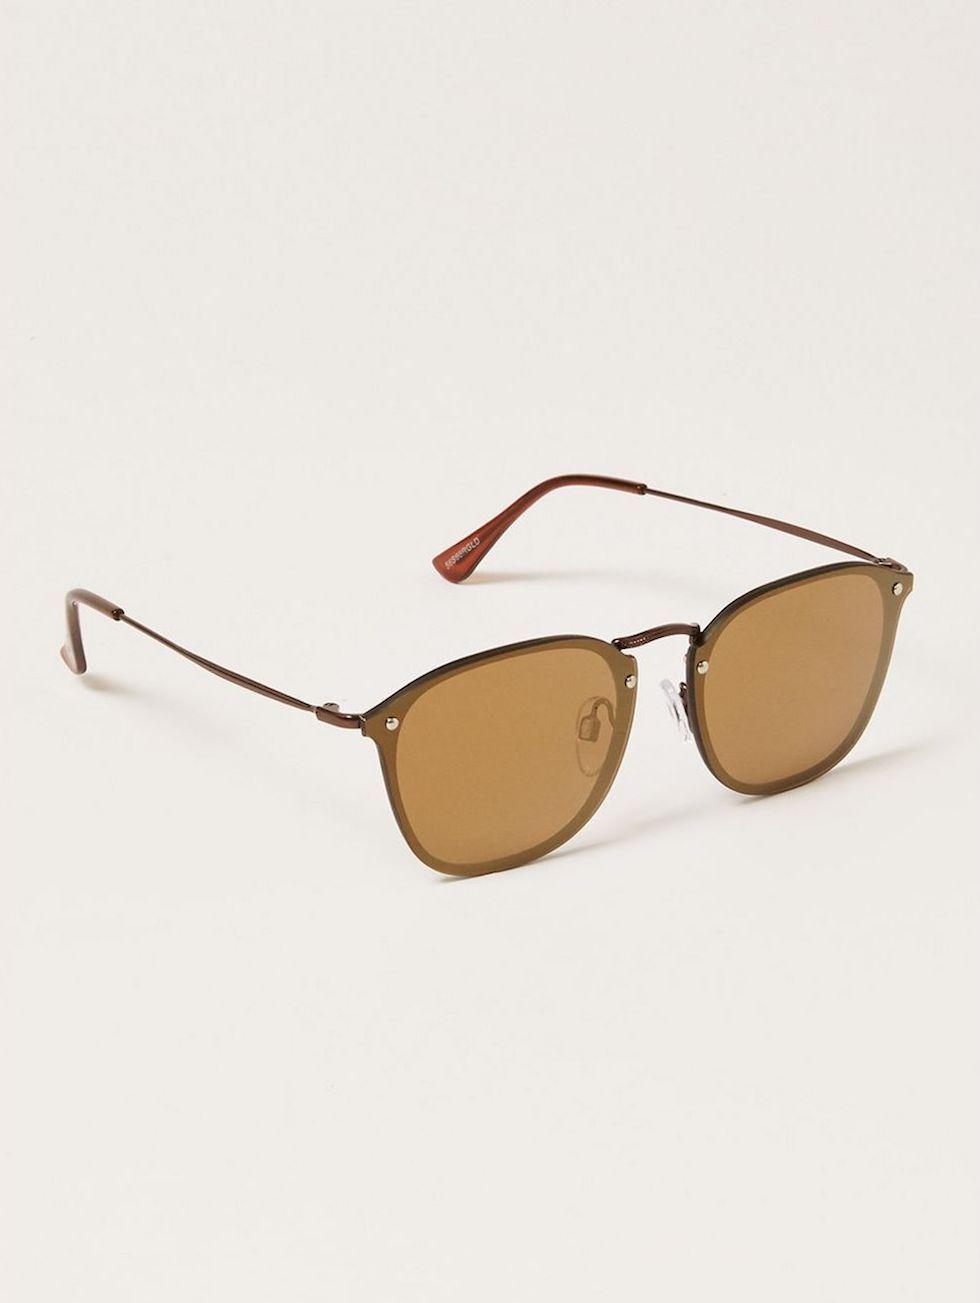 db4d0fa654 The 10 Best Sunglasses For Men 2018 - Stylish New Sunglasses For Men